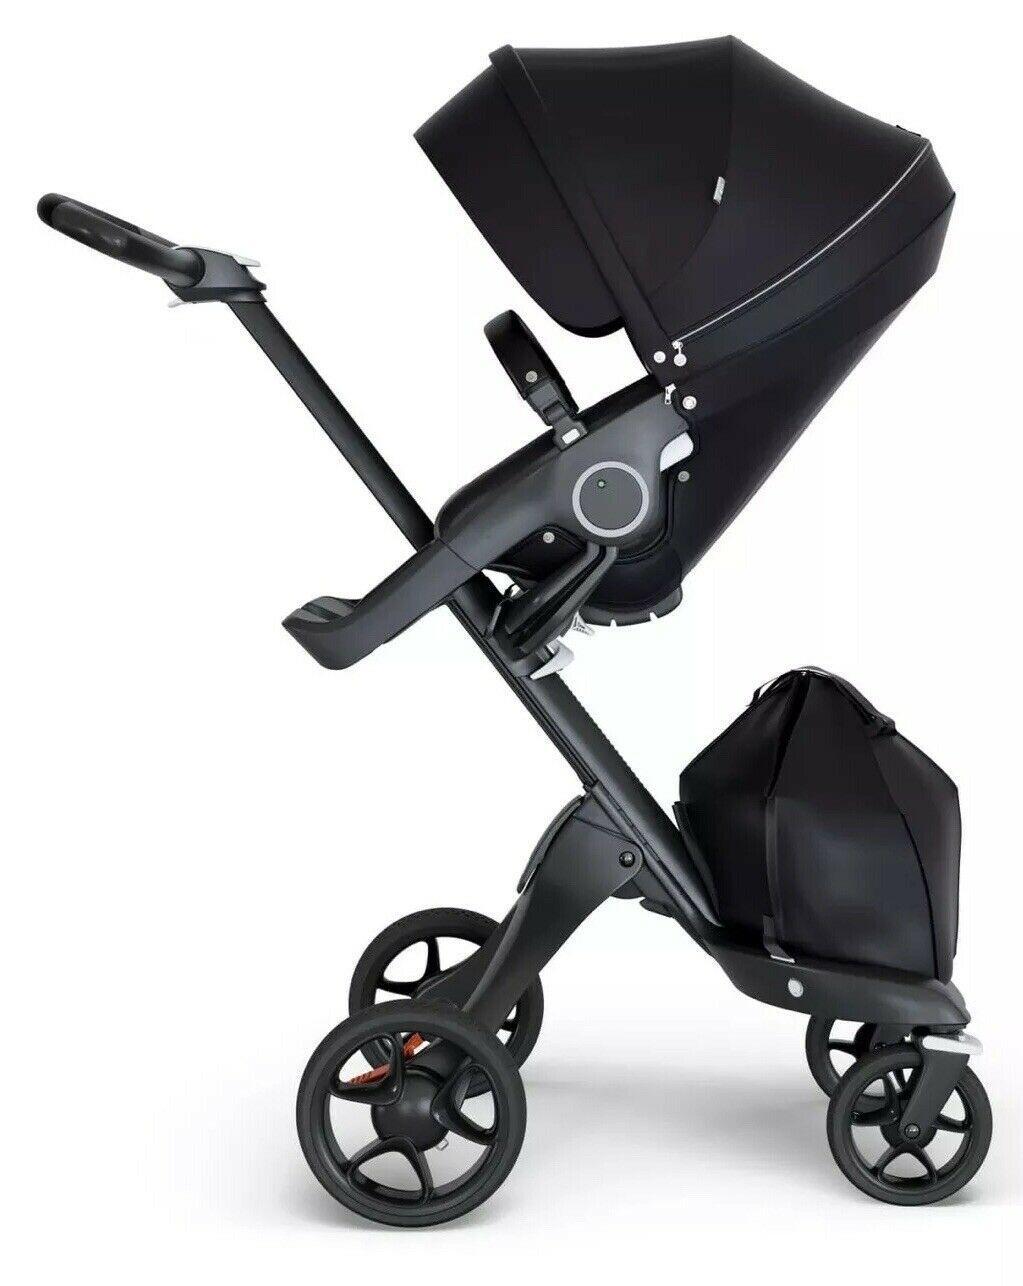 STOKKE Xplory V6 Black Chassis Stroller